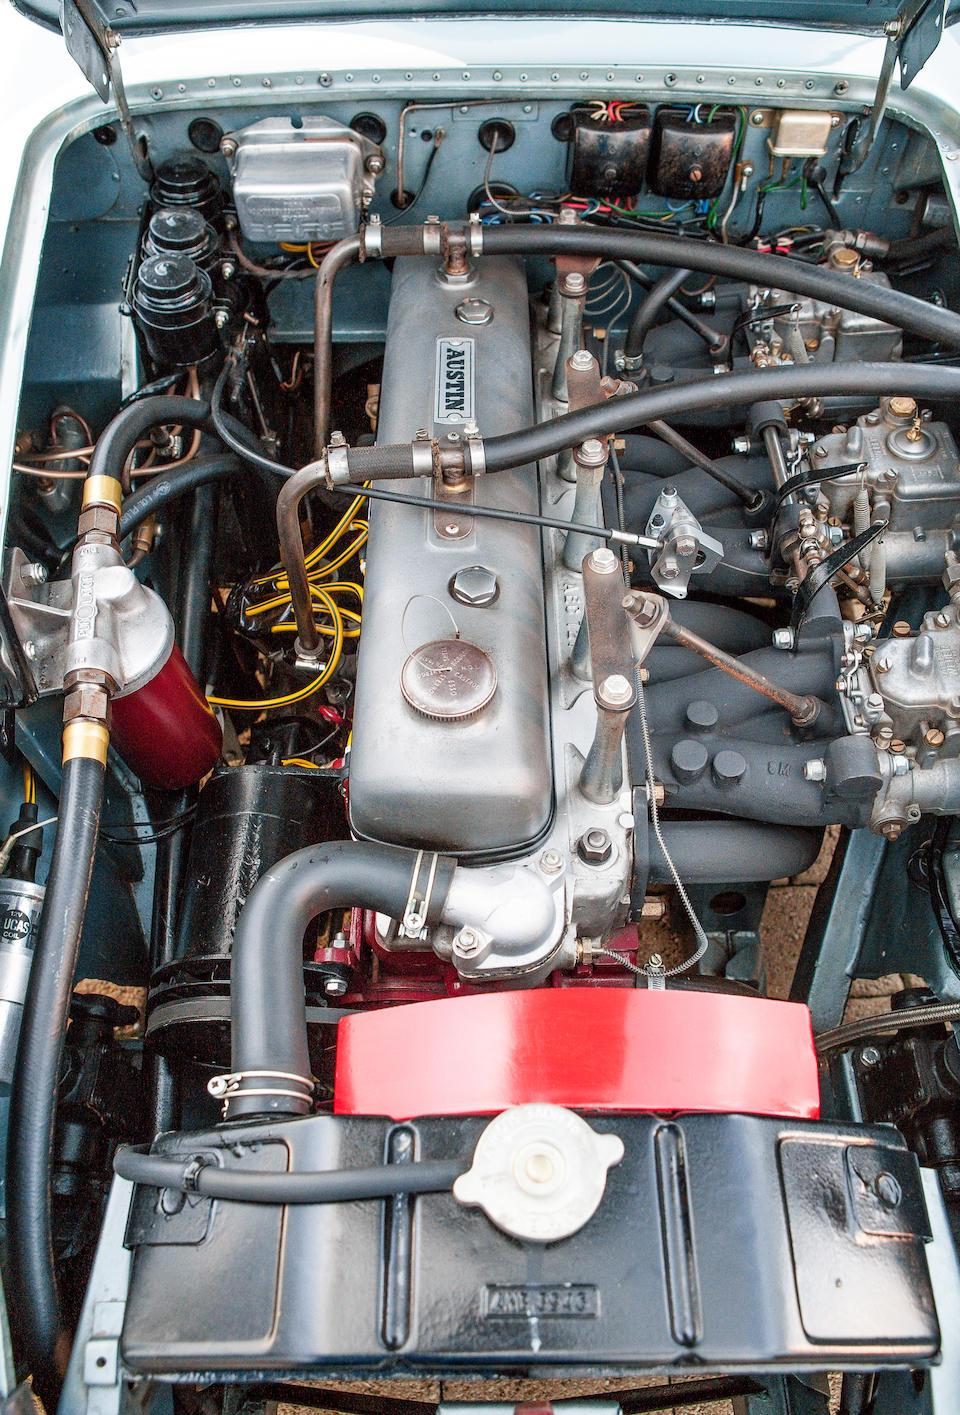 '767 KNX' - The ex-Works, Sebring 12-Hours, Targa Florio,1964 Austin-Healey 3000 MkII Lightweight  Chassis no. HBJ7-64H-57-2 Engine no. XSP 2157-2